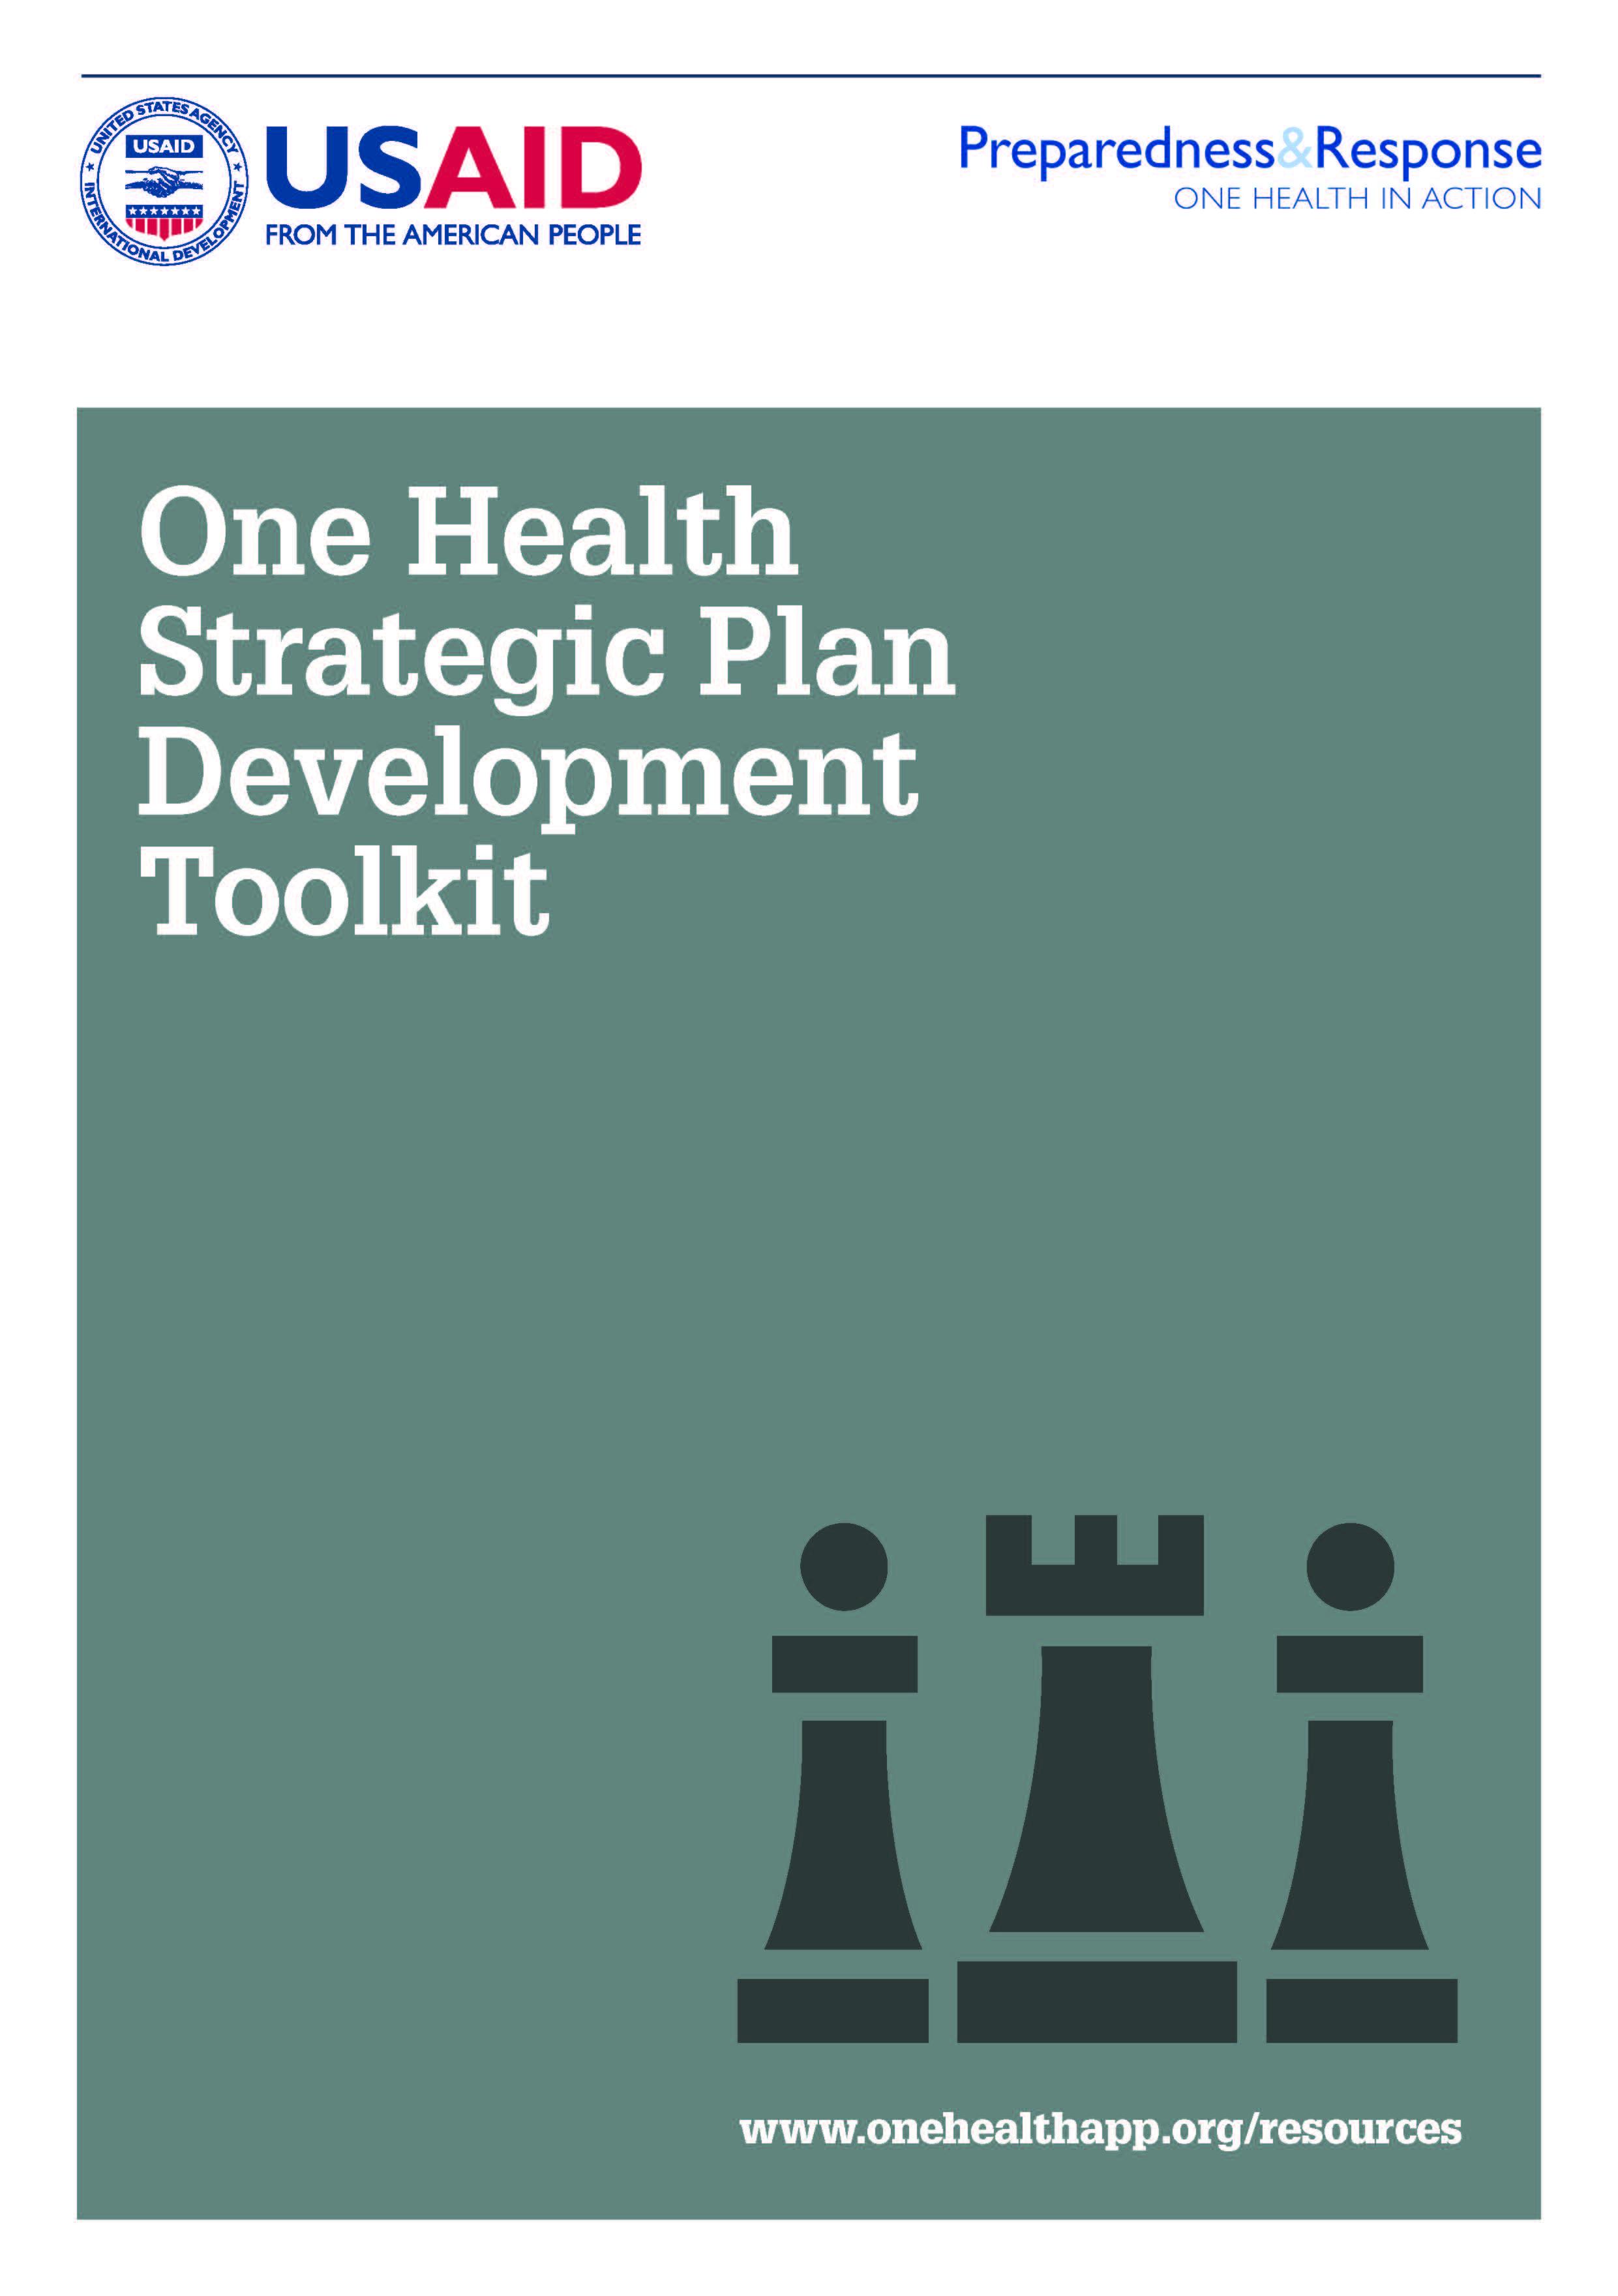 One Health Strategic Plans Toolkit